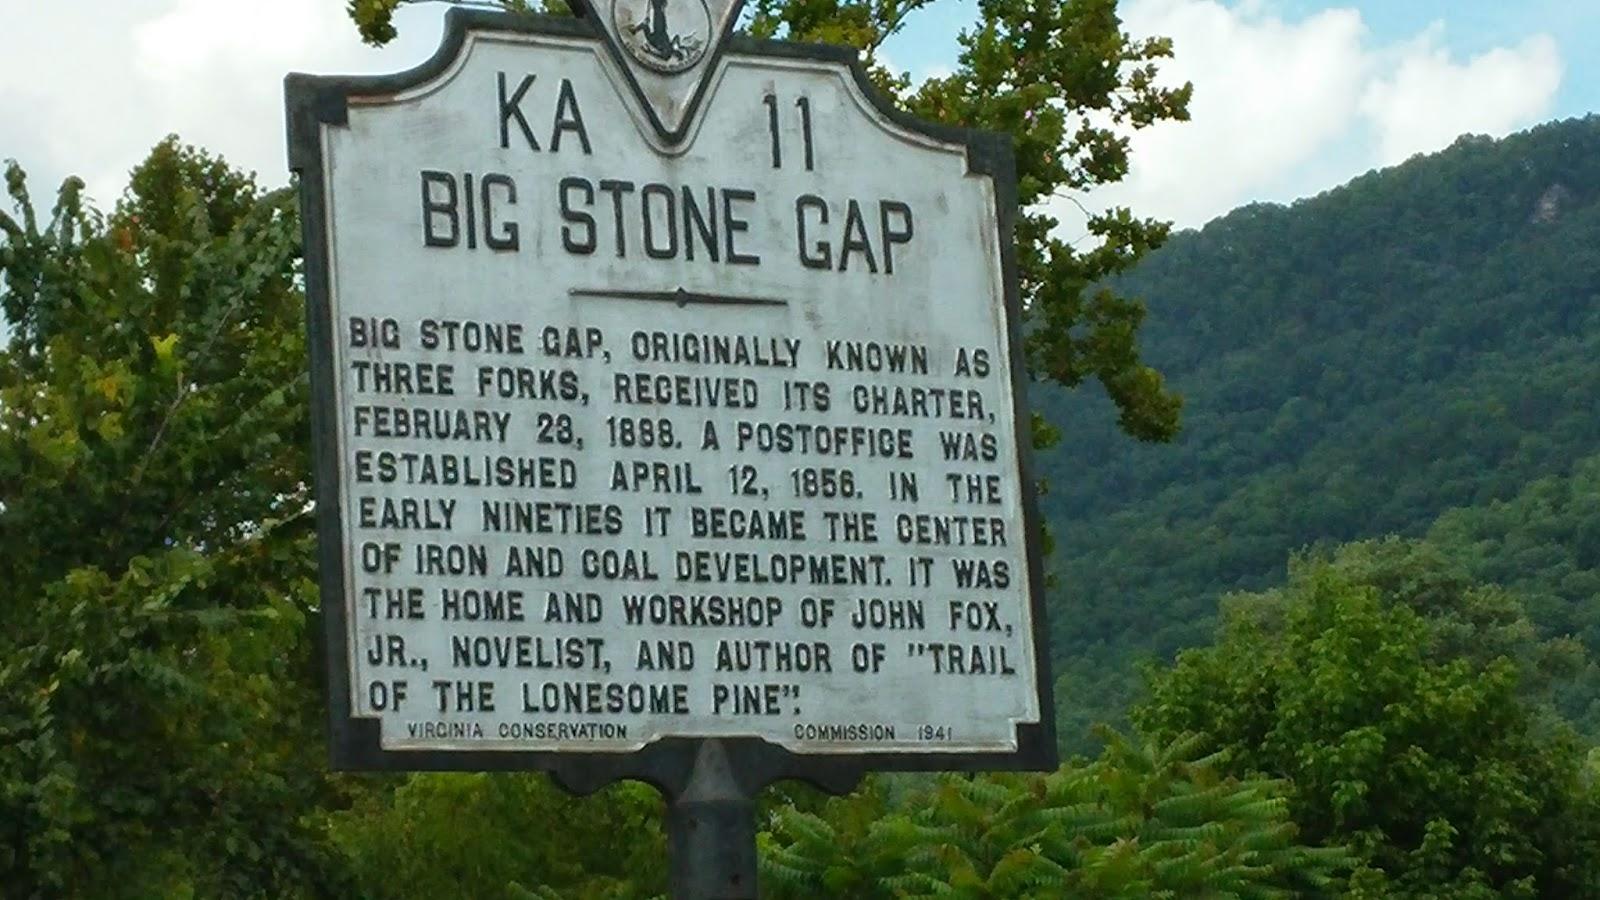 Big Stone Gap Elevation : Eas on down the road big stone gap va